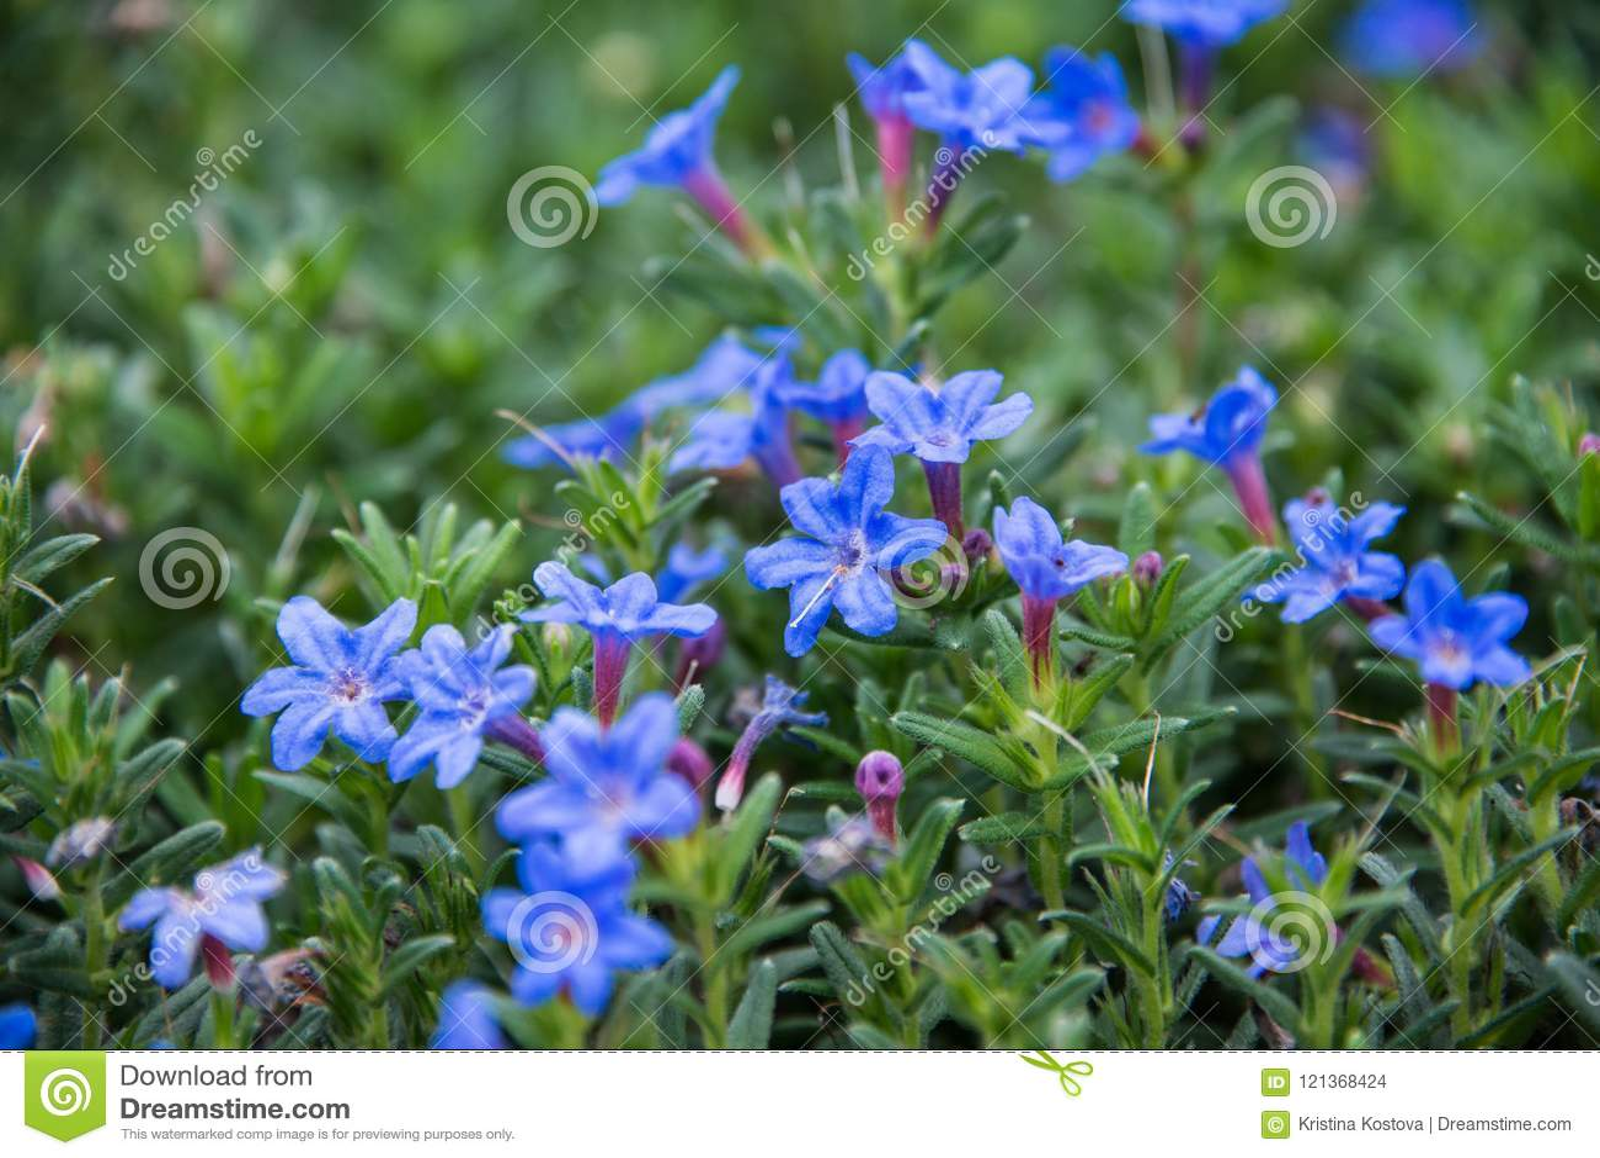 A beautiful blue Lithodora in a green soil background.